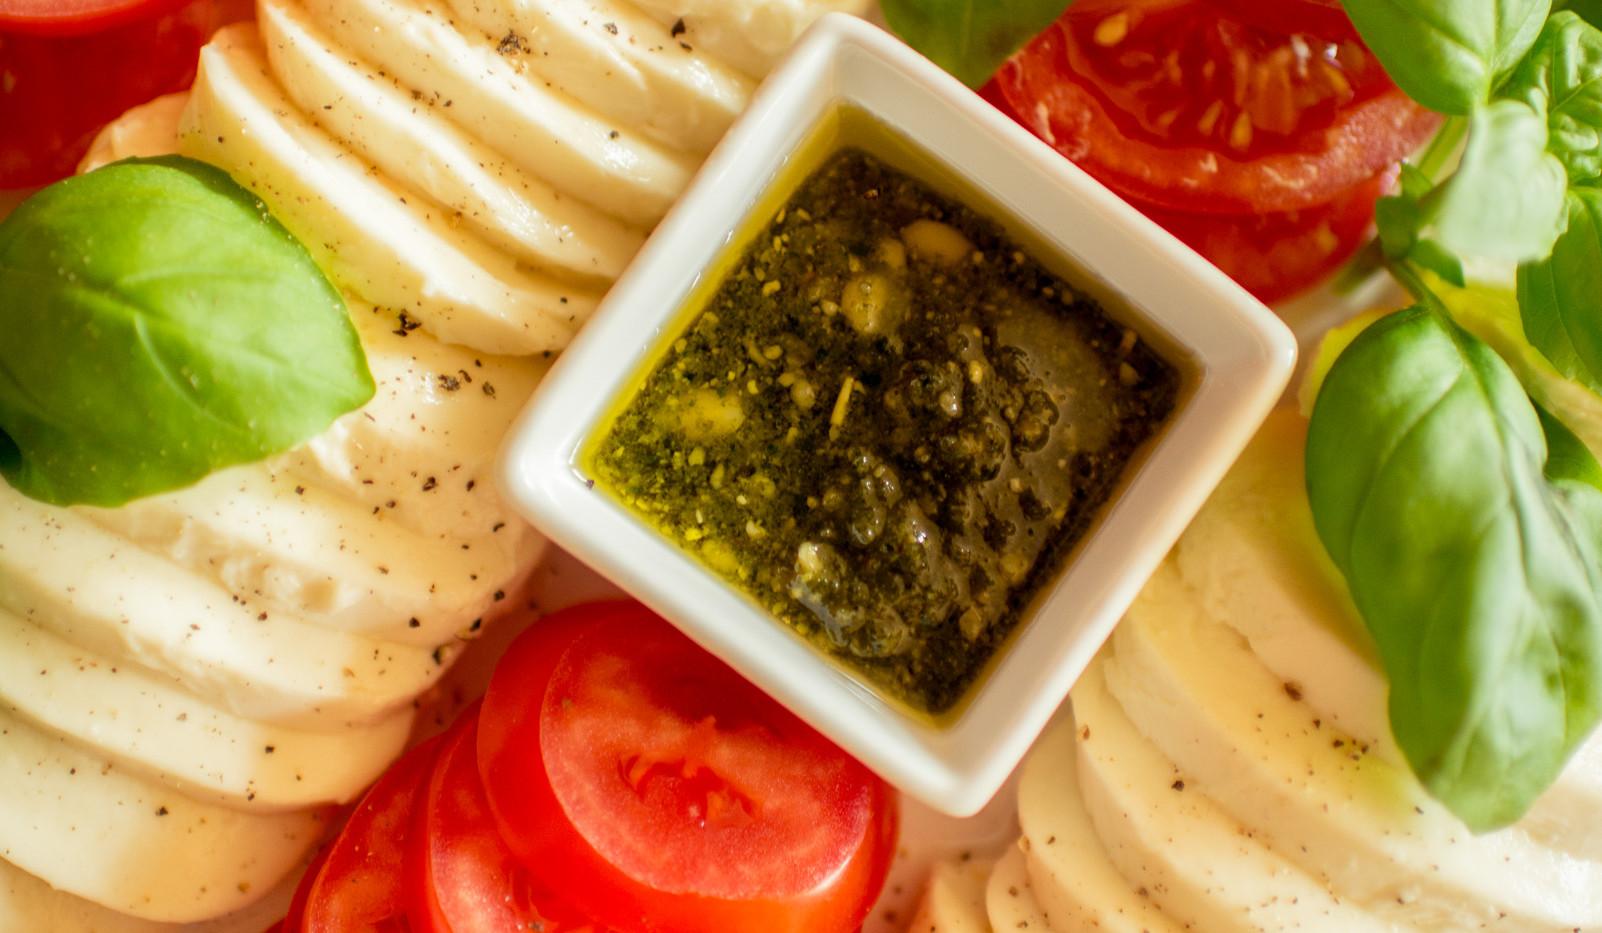 Mozarella und Tomate Frühstücks-Manufaktur